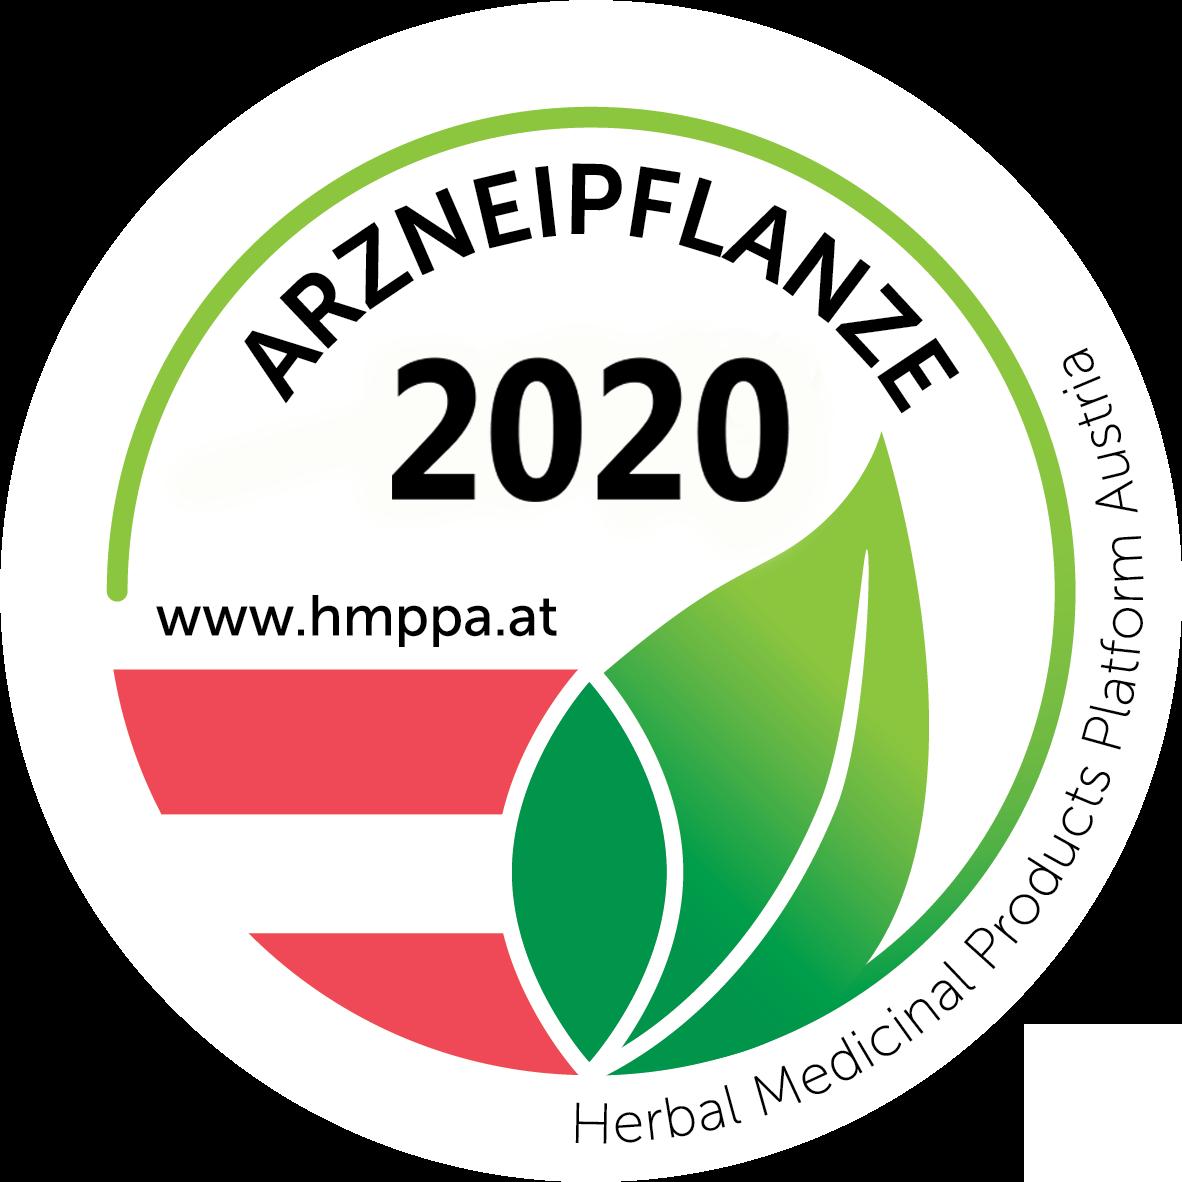 Arzneipflanze 2020 Logo